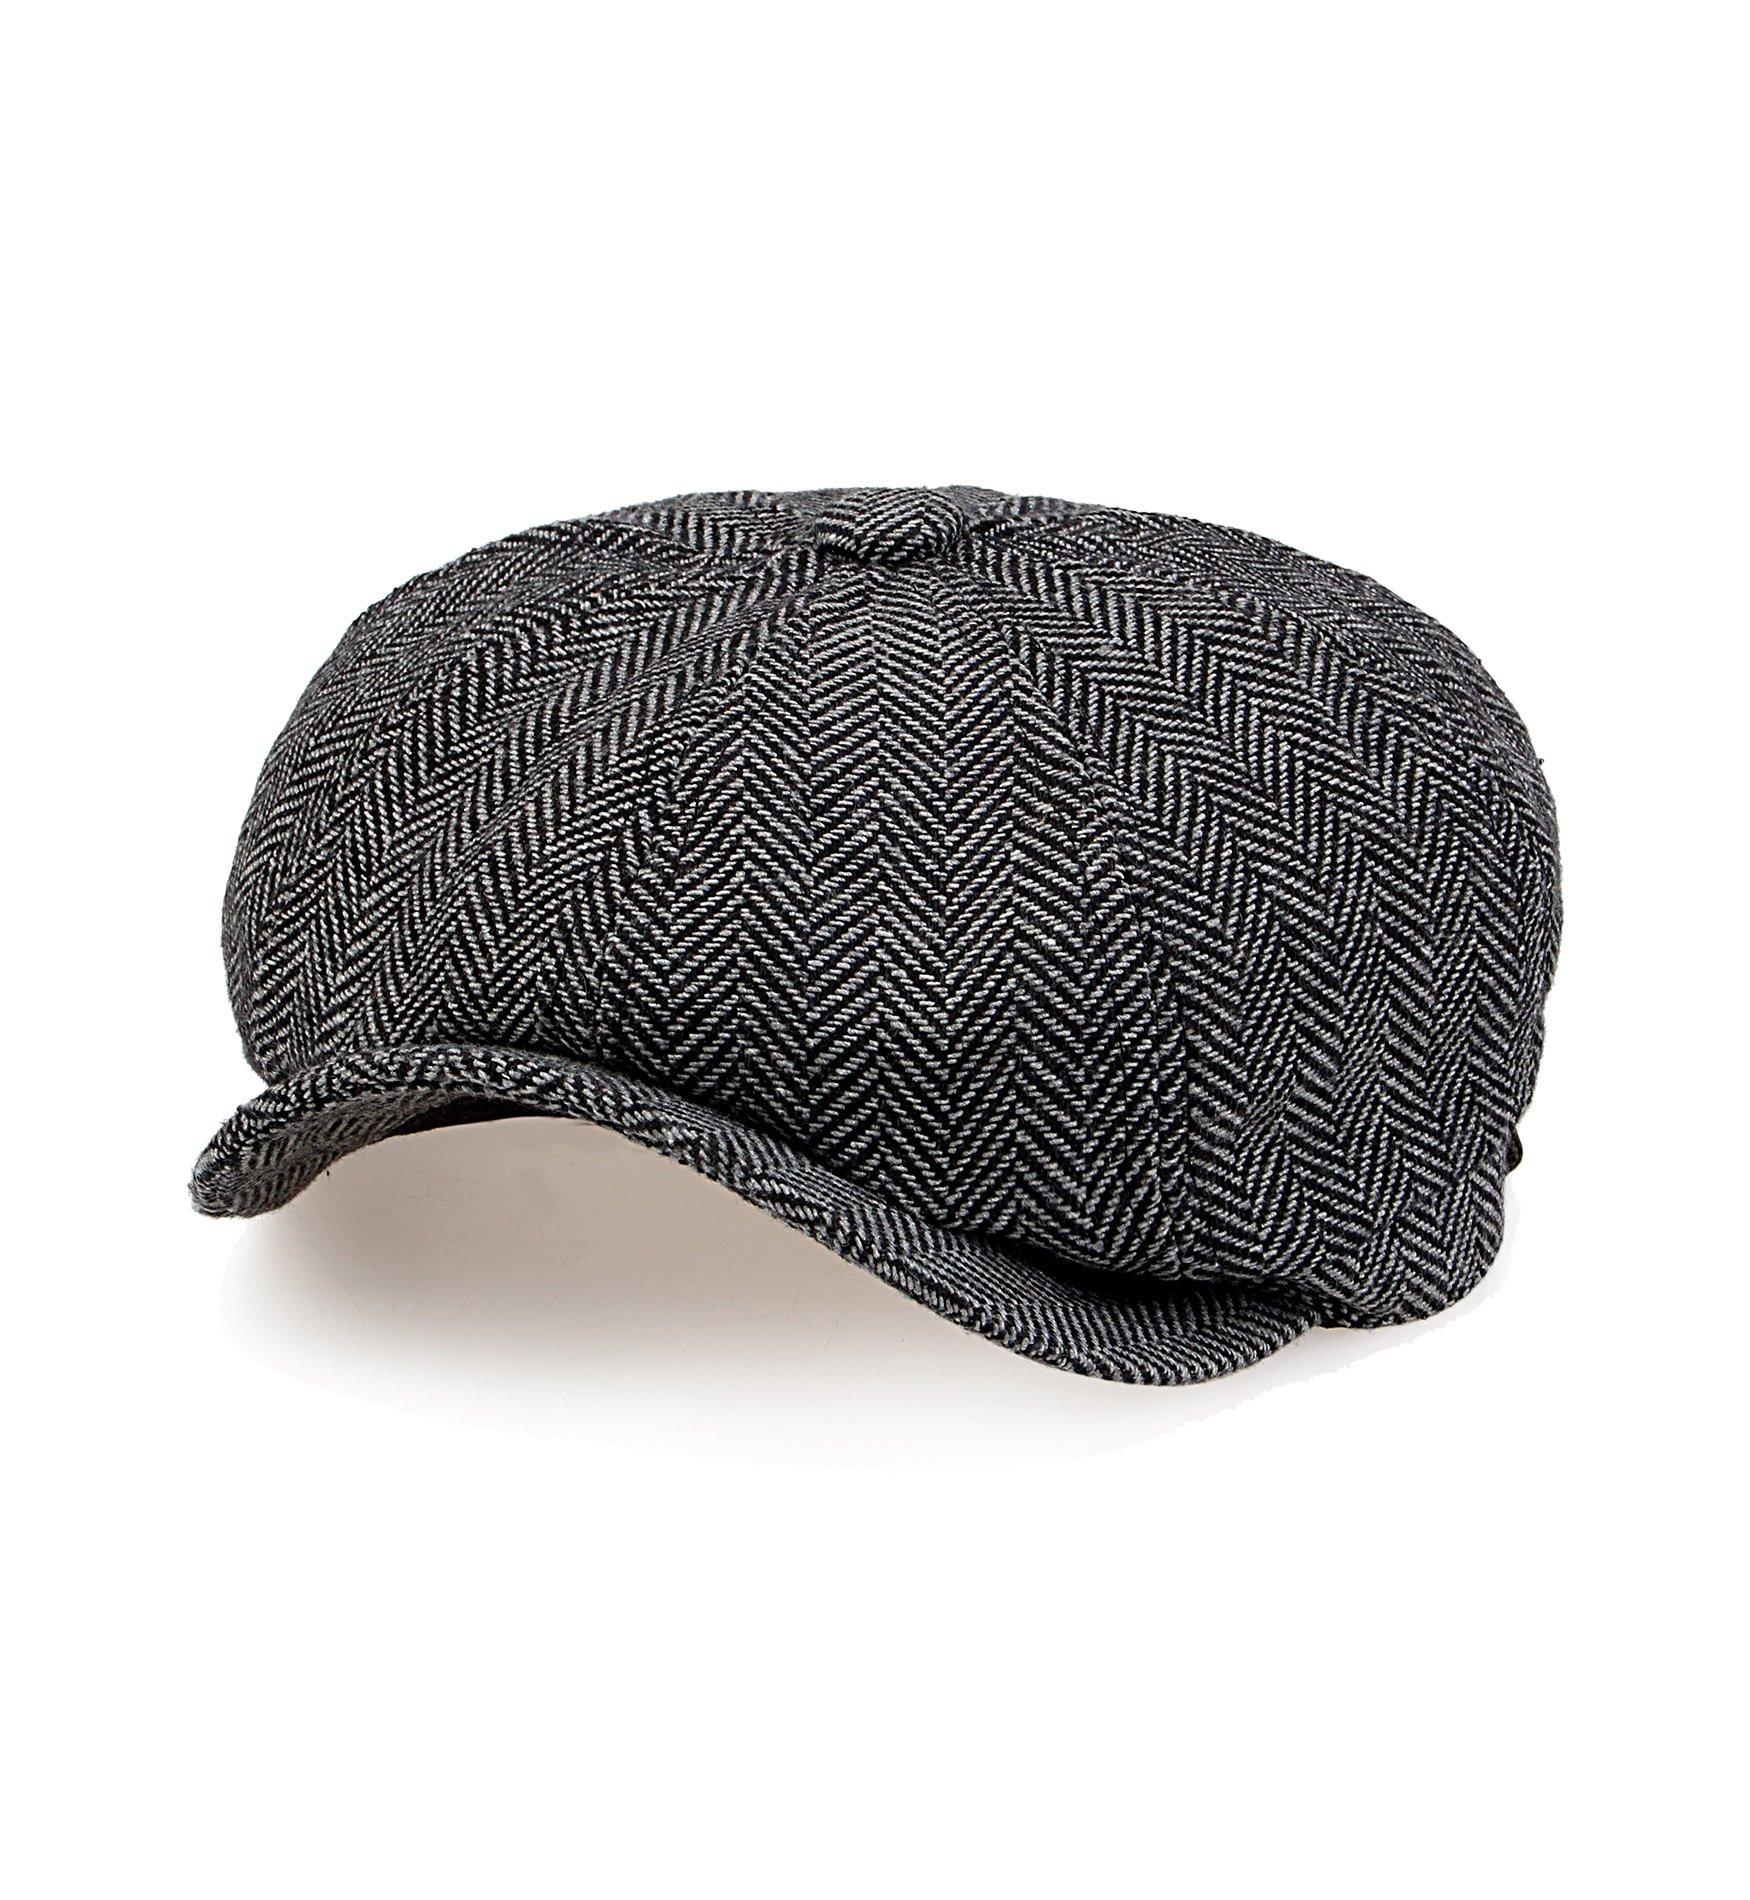 Sumolux Mens Tweed Cap 8 Panel Herringbone Irish Caps newsboy IVY Linen Snap Brim Hat